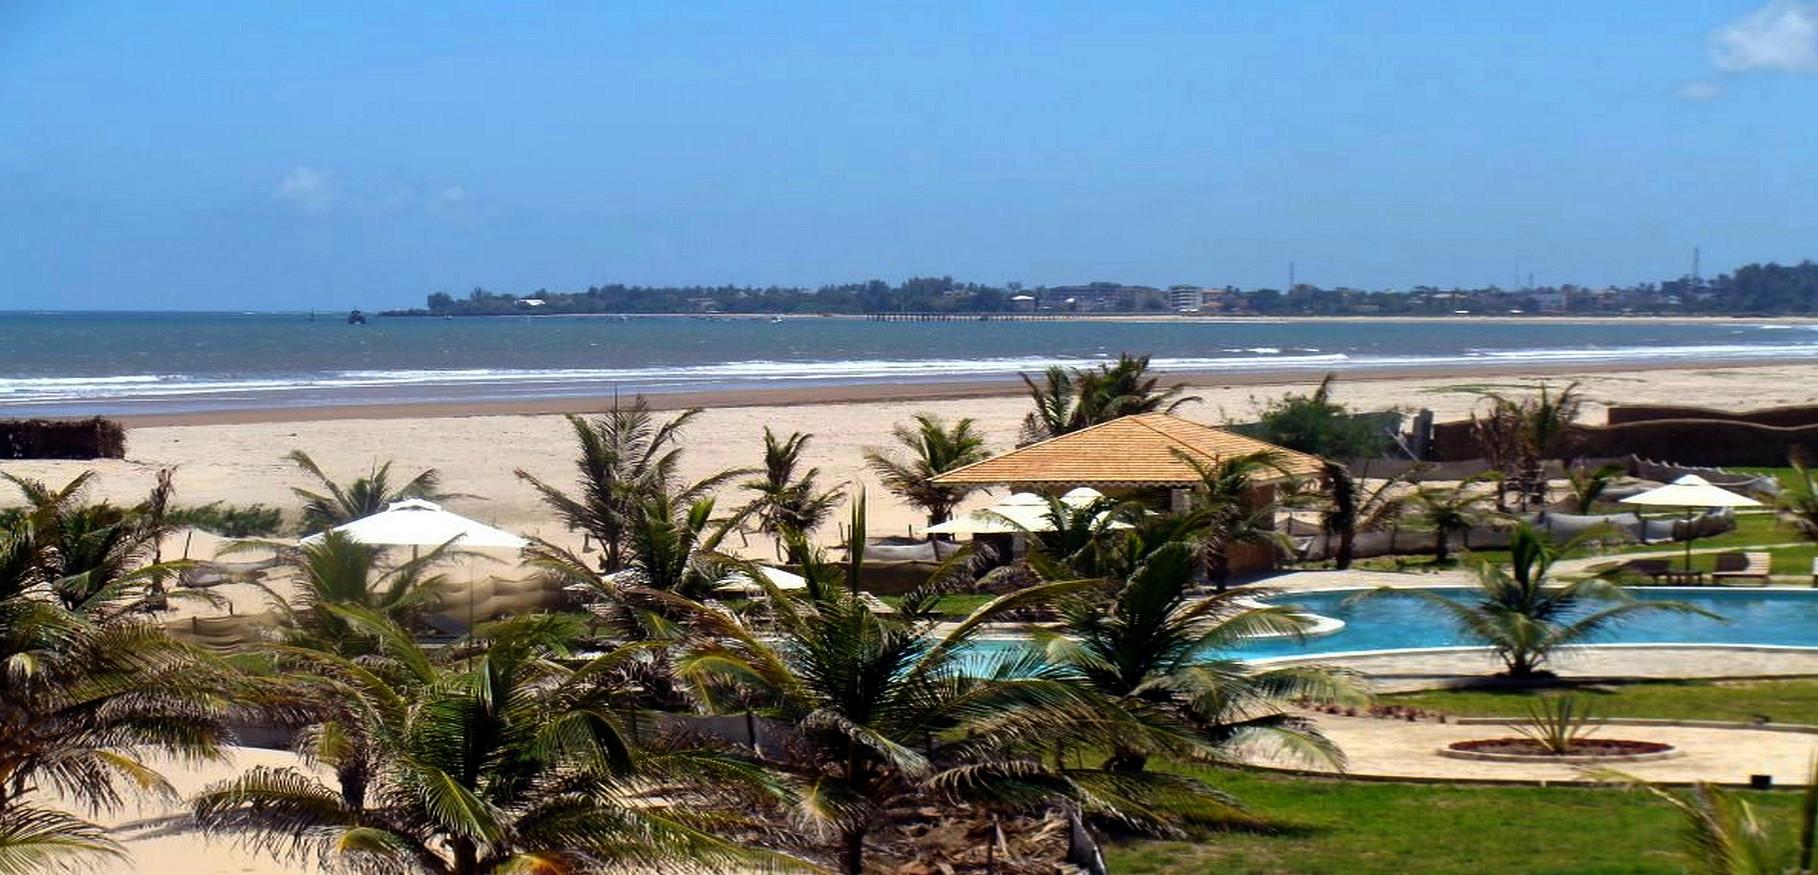 Malindi beach, Kenya